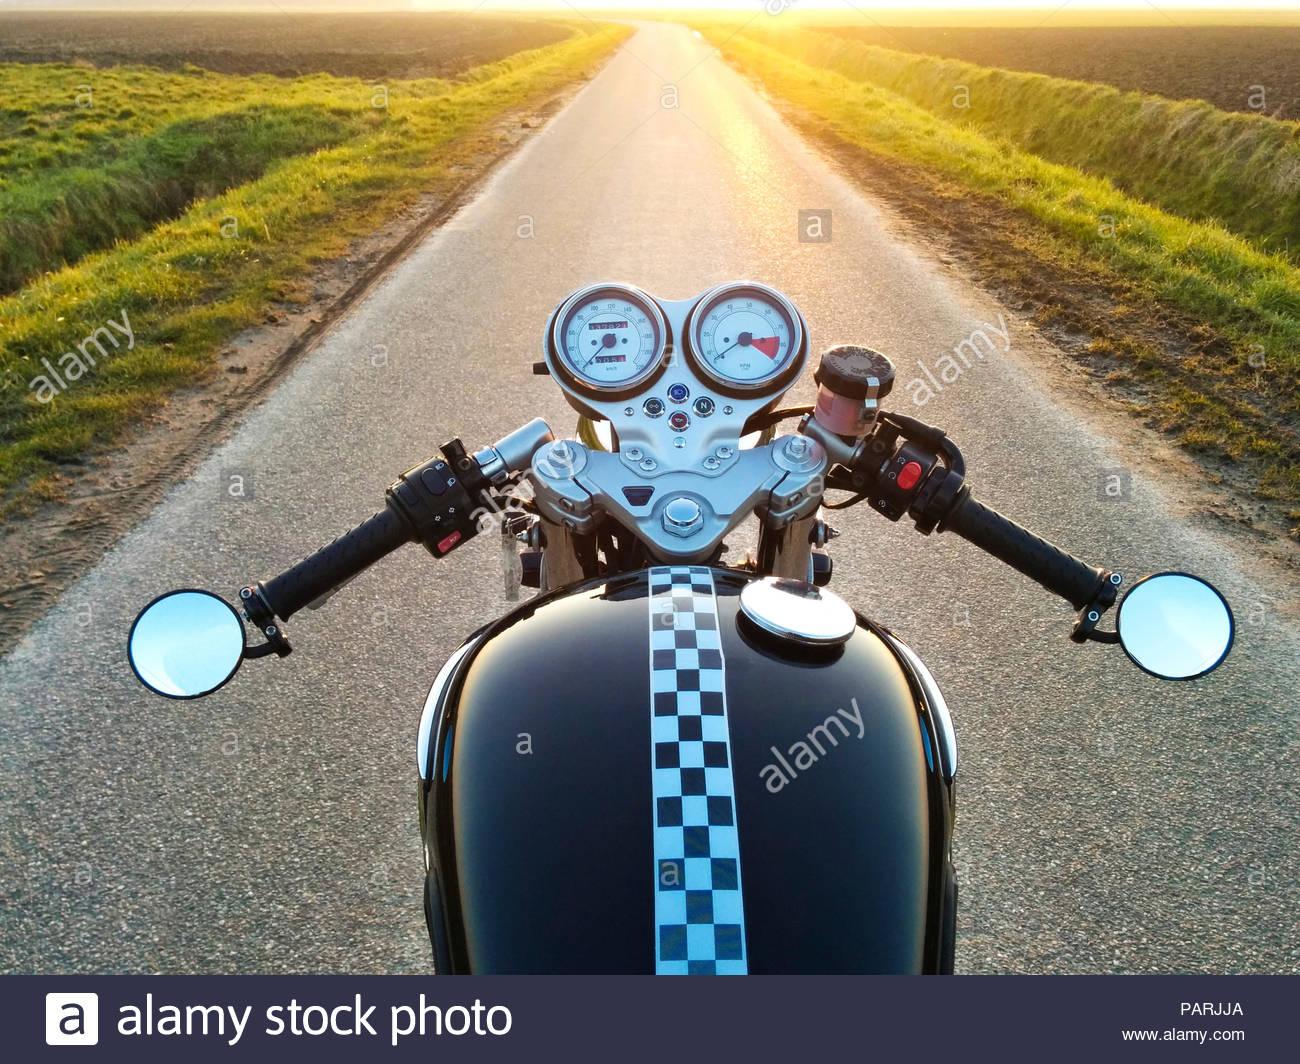 Primer plano de una bicicleta en una carretera Imagen De Stock